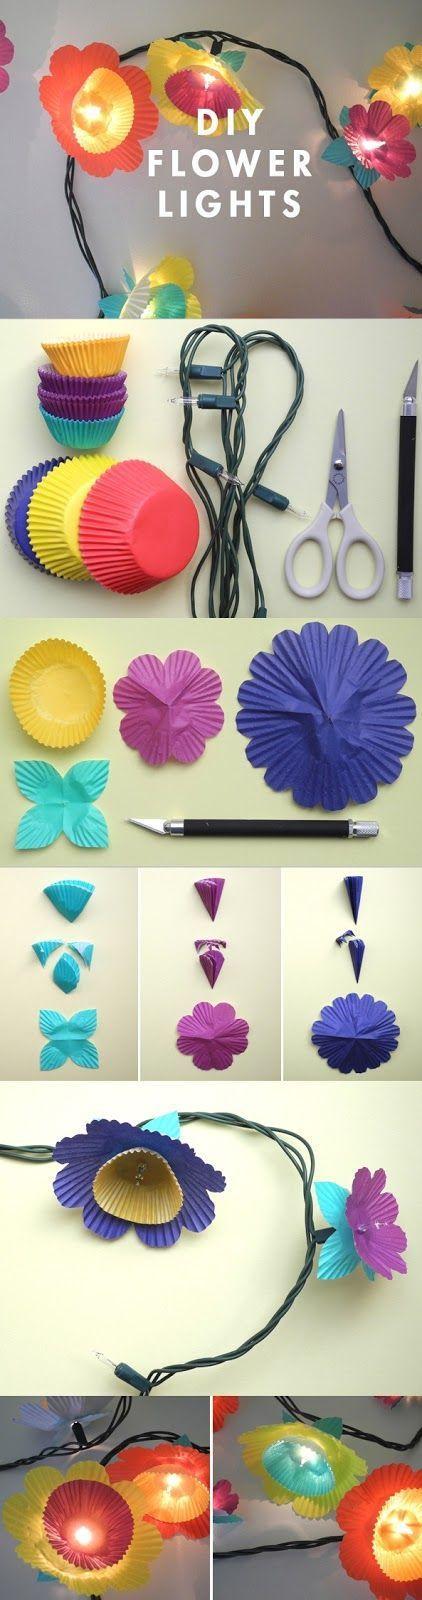 Diy Crafts Ideas : DIY cupcake liner flower lights